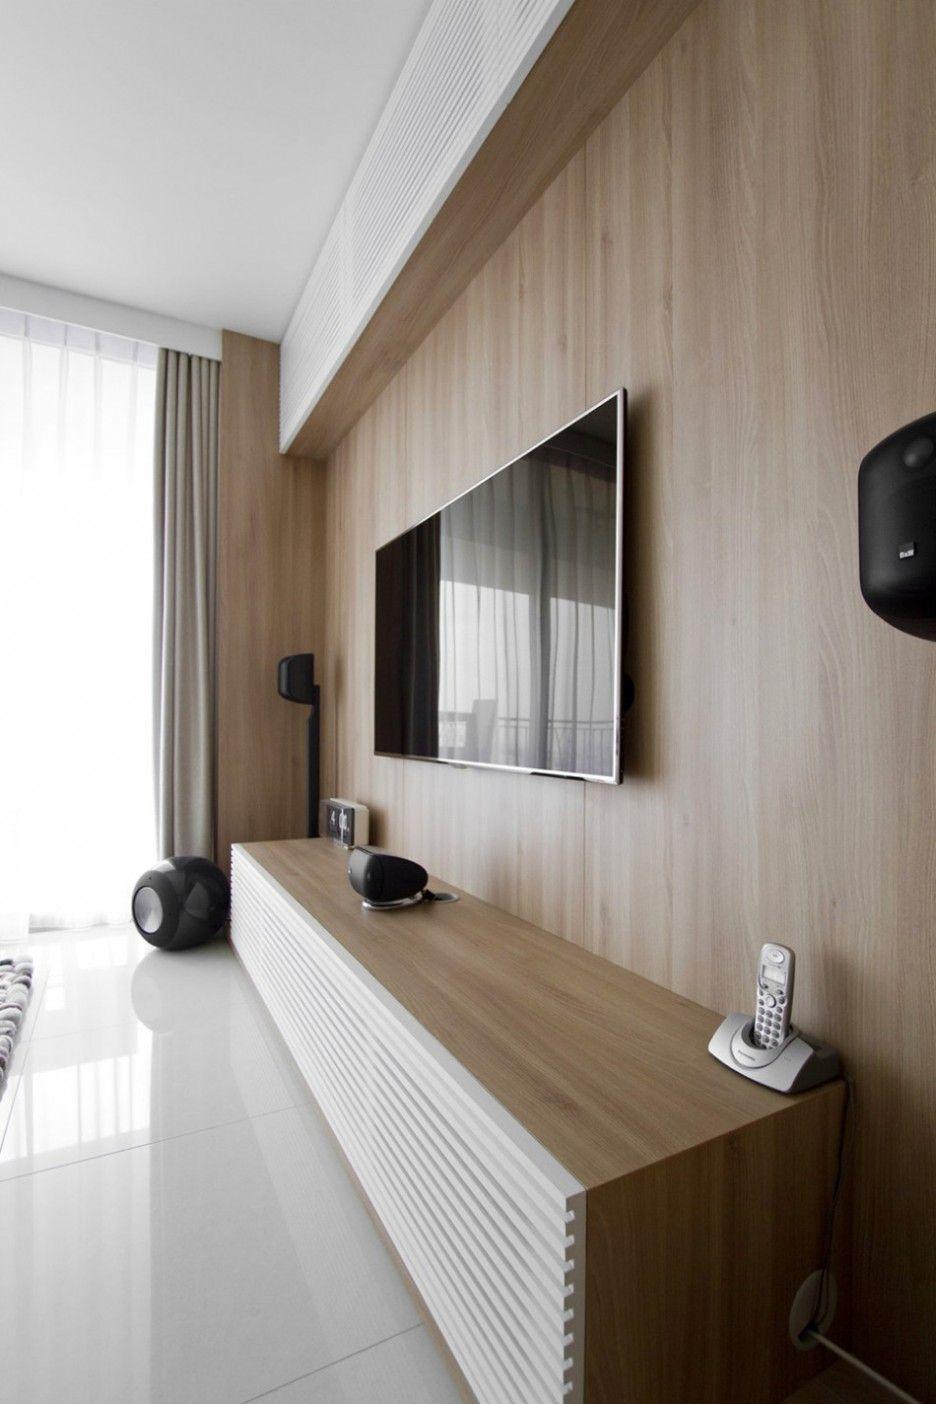 Tv Unit Design Wall Mounted: Inspiring Modern Apartment Interior Wooden Wall Accent